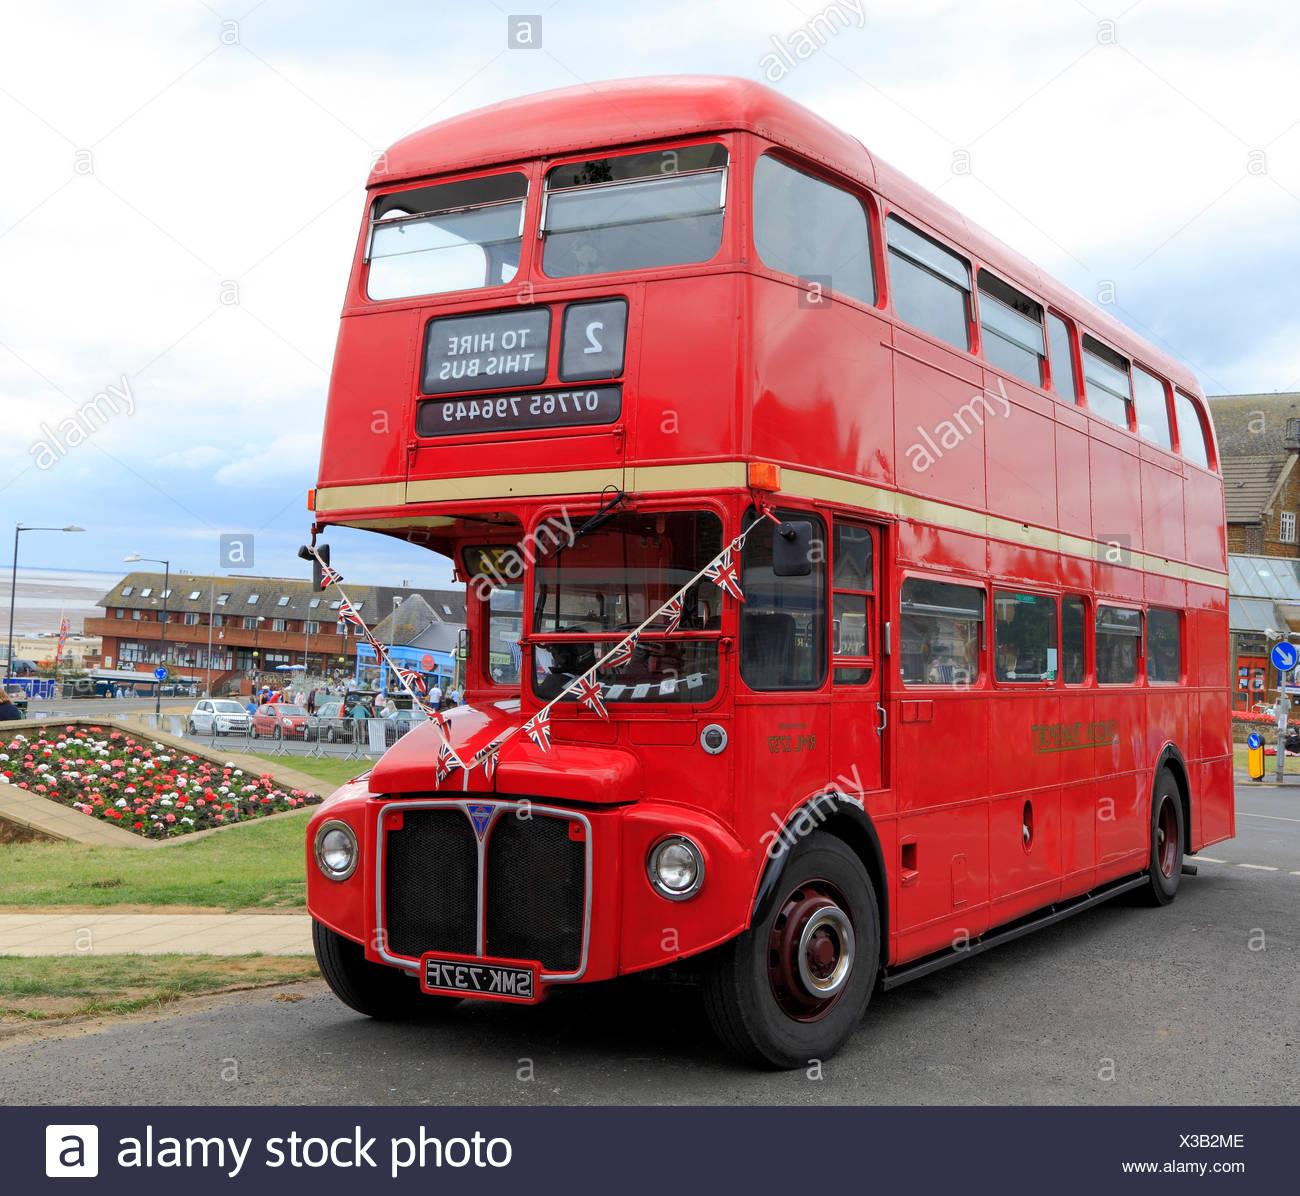 Vintage, rot, London Transport Bus, Hunstanton, Norfolk, England, UK, touristische Attraktion Stockbild